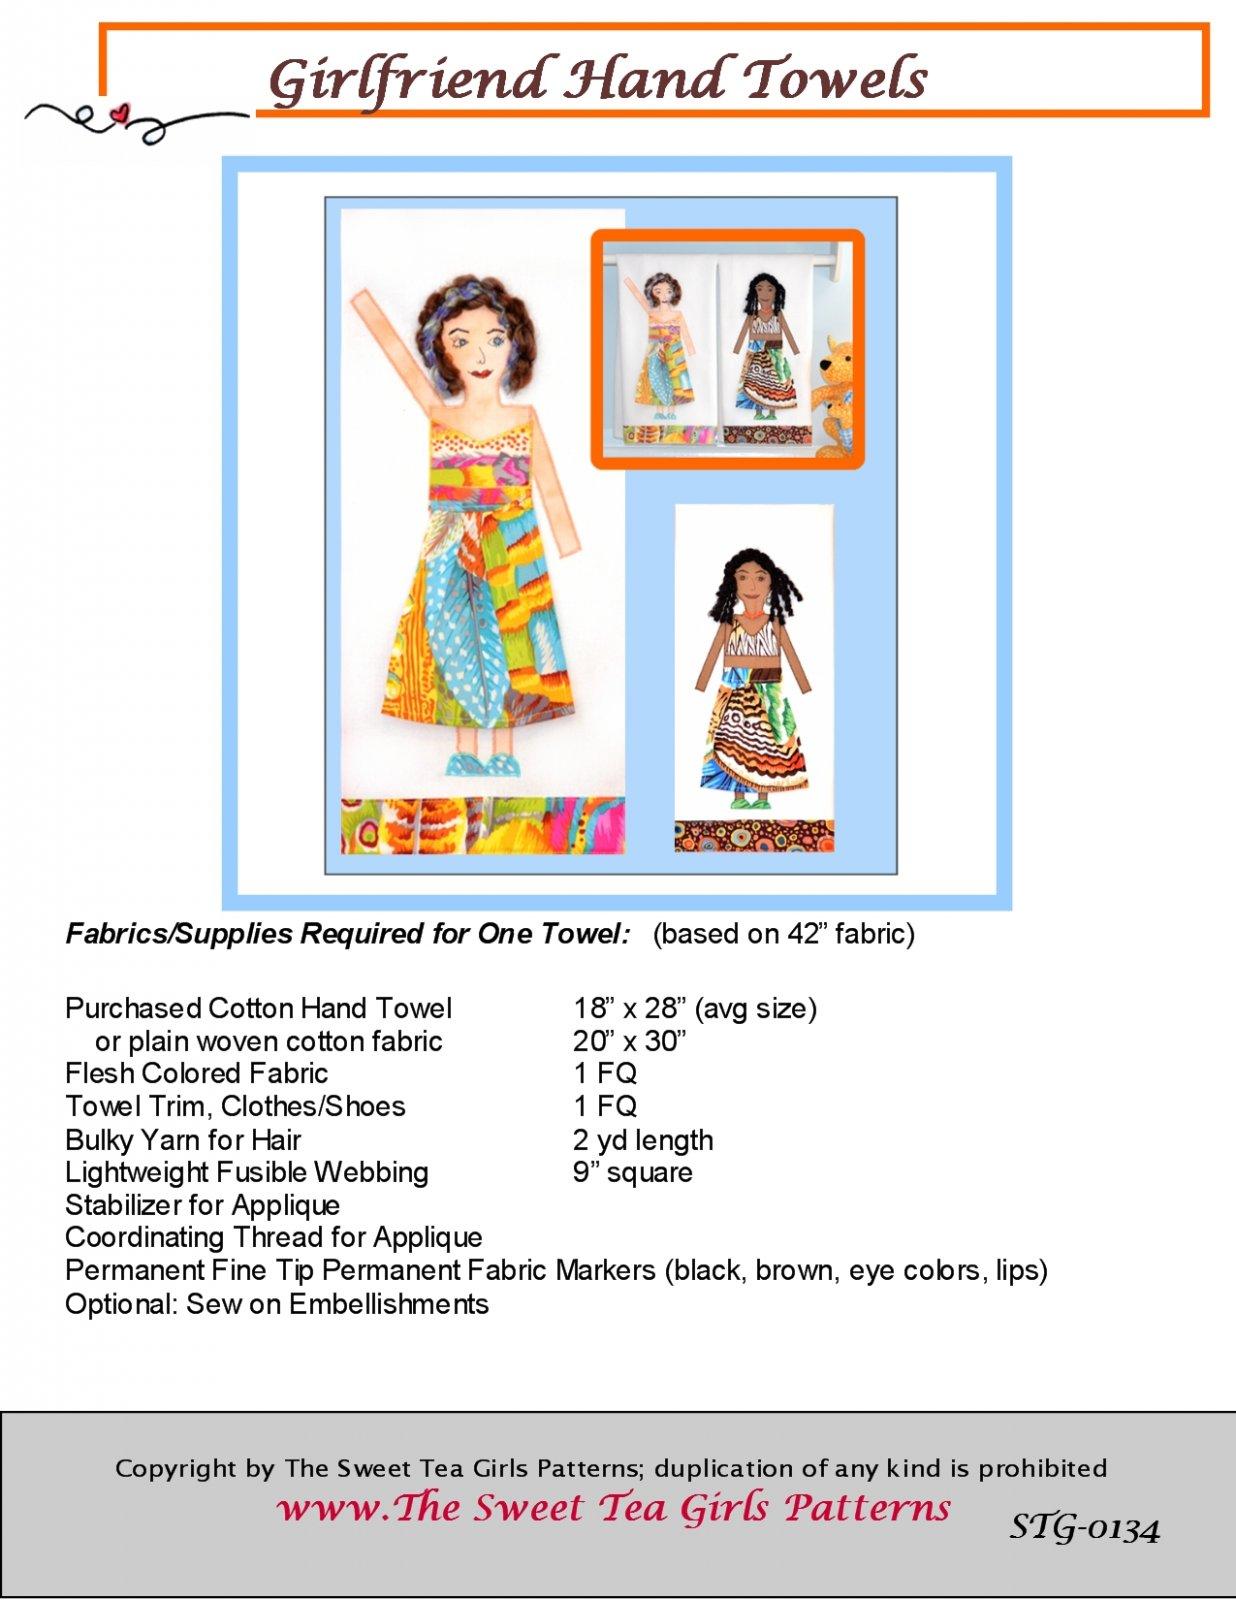 Girlfriend Hand Towels - Downloadable PDF